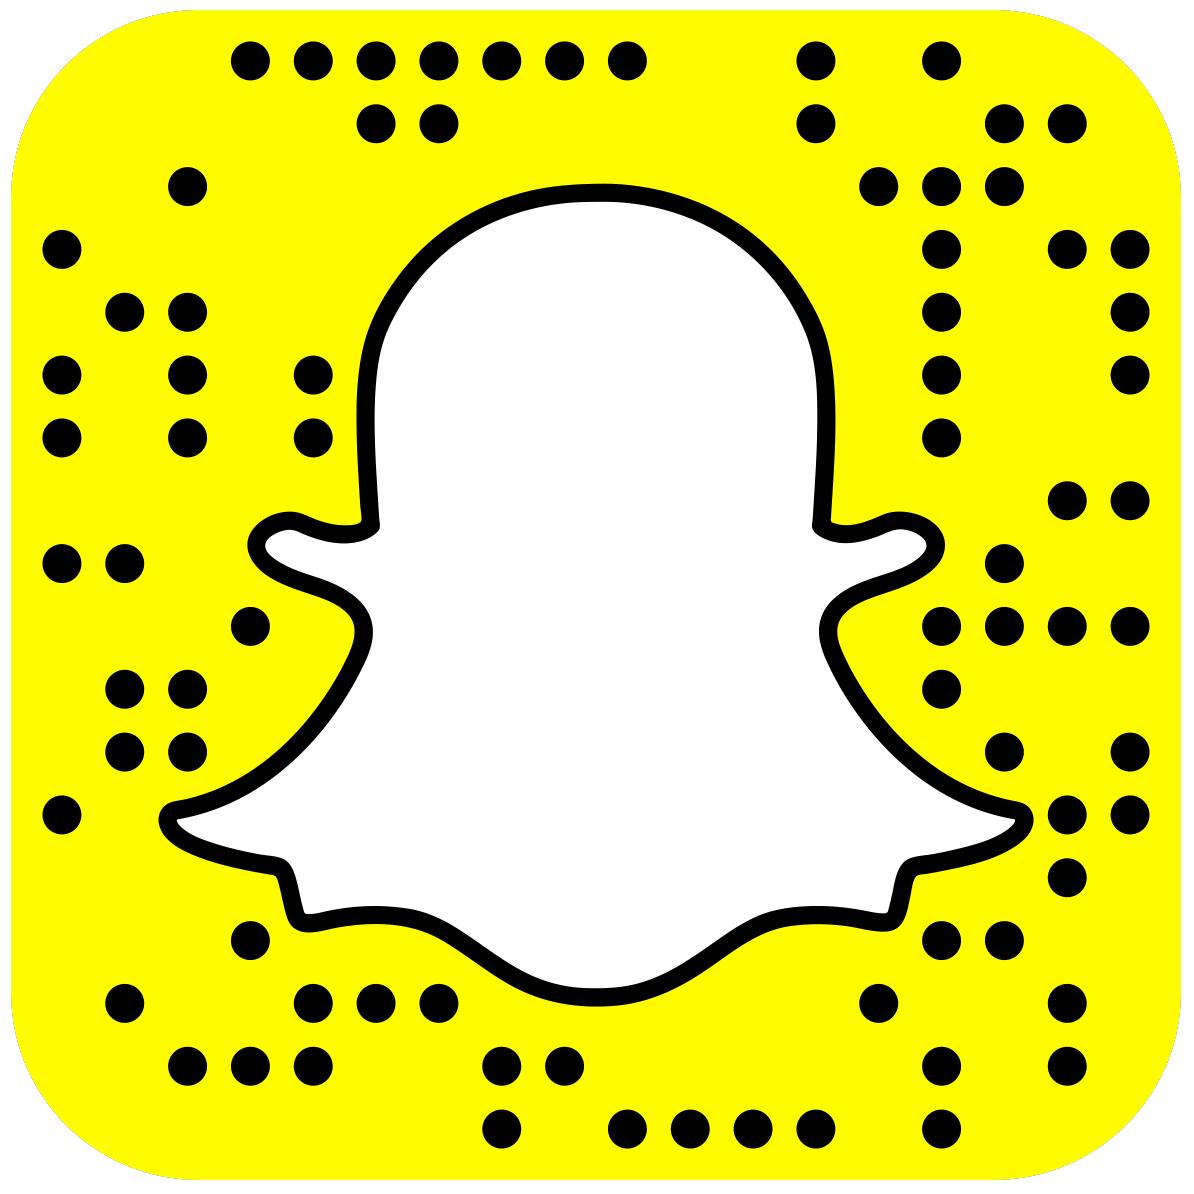 Chase Chrisley Snapchat username